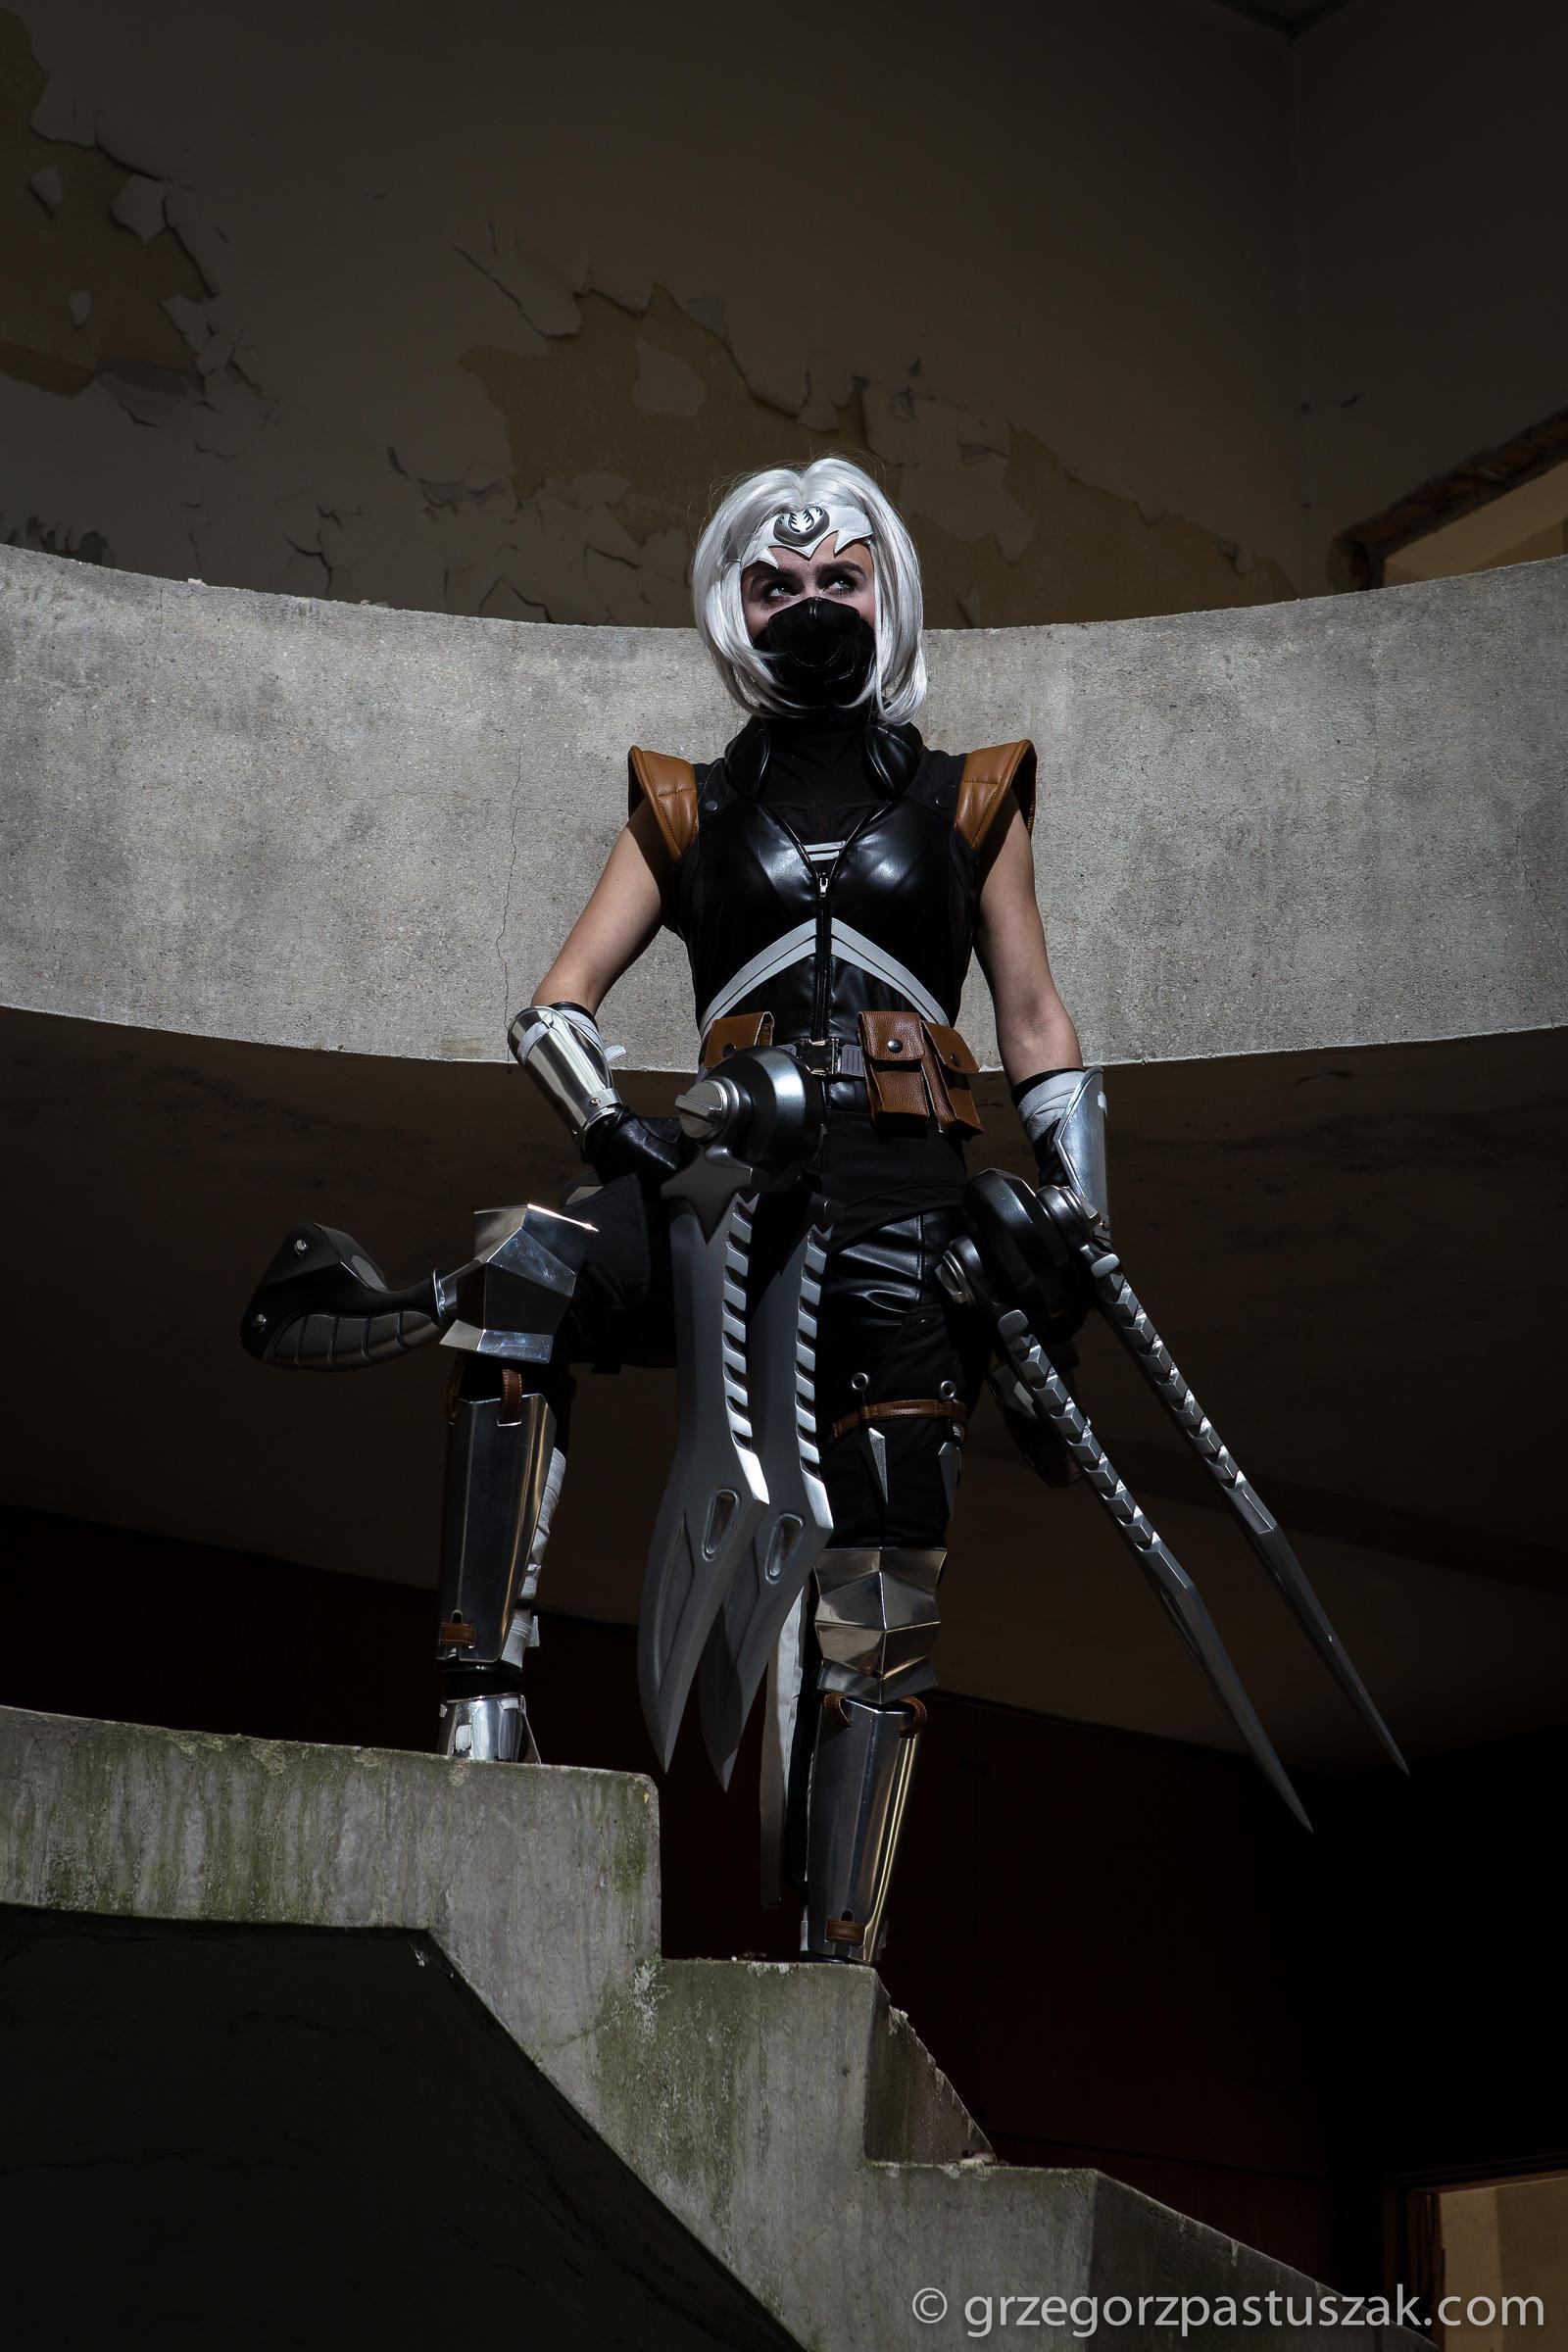 Silverfang Akali cosplay #2 by AyanoGaming on DeviantArt